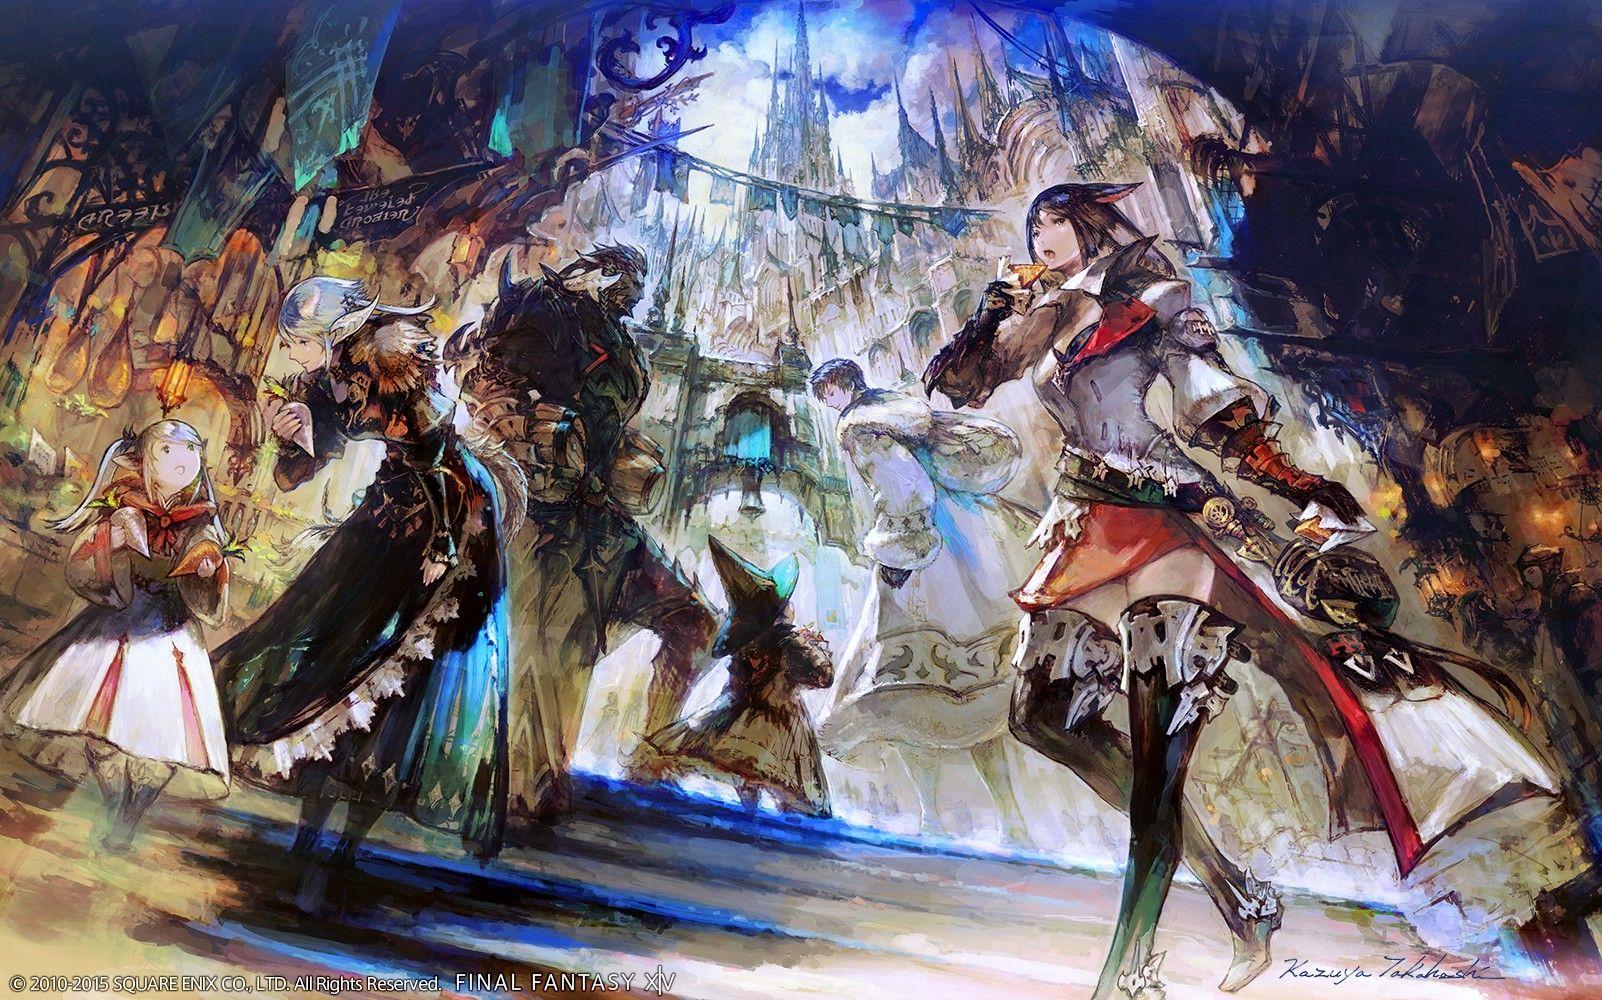 Final Fantasy 14 Heavensward Wallpapers For Free Wallpaper Final Fantasy Art Final Fantasy Xiv Final Fantasy 14